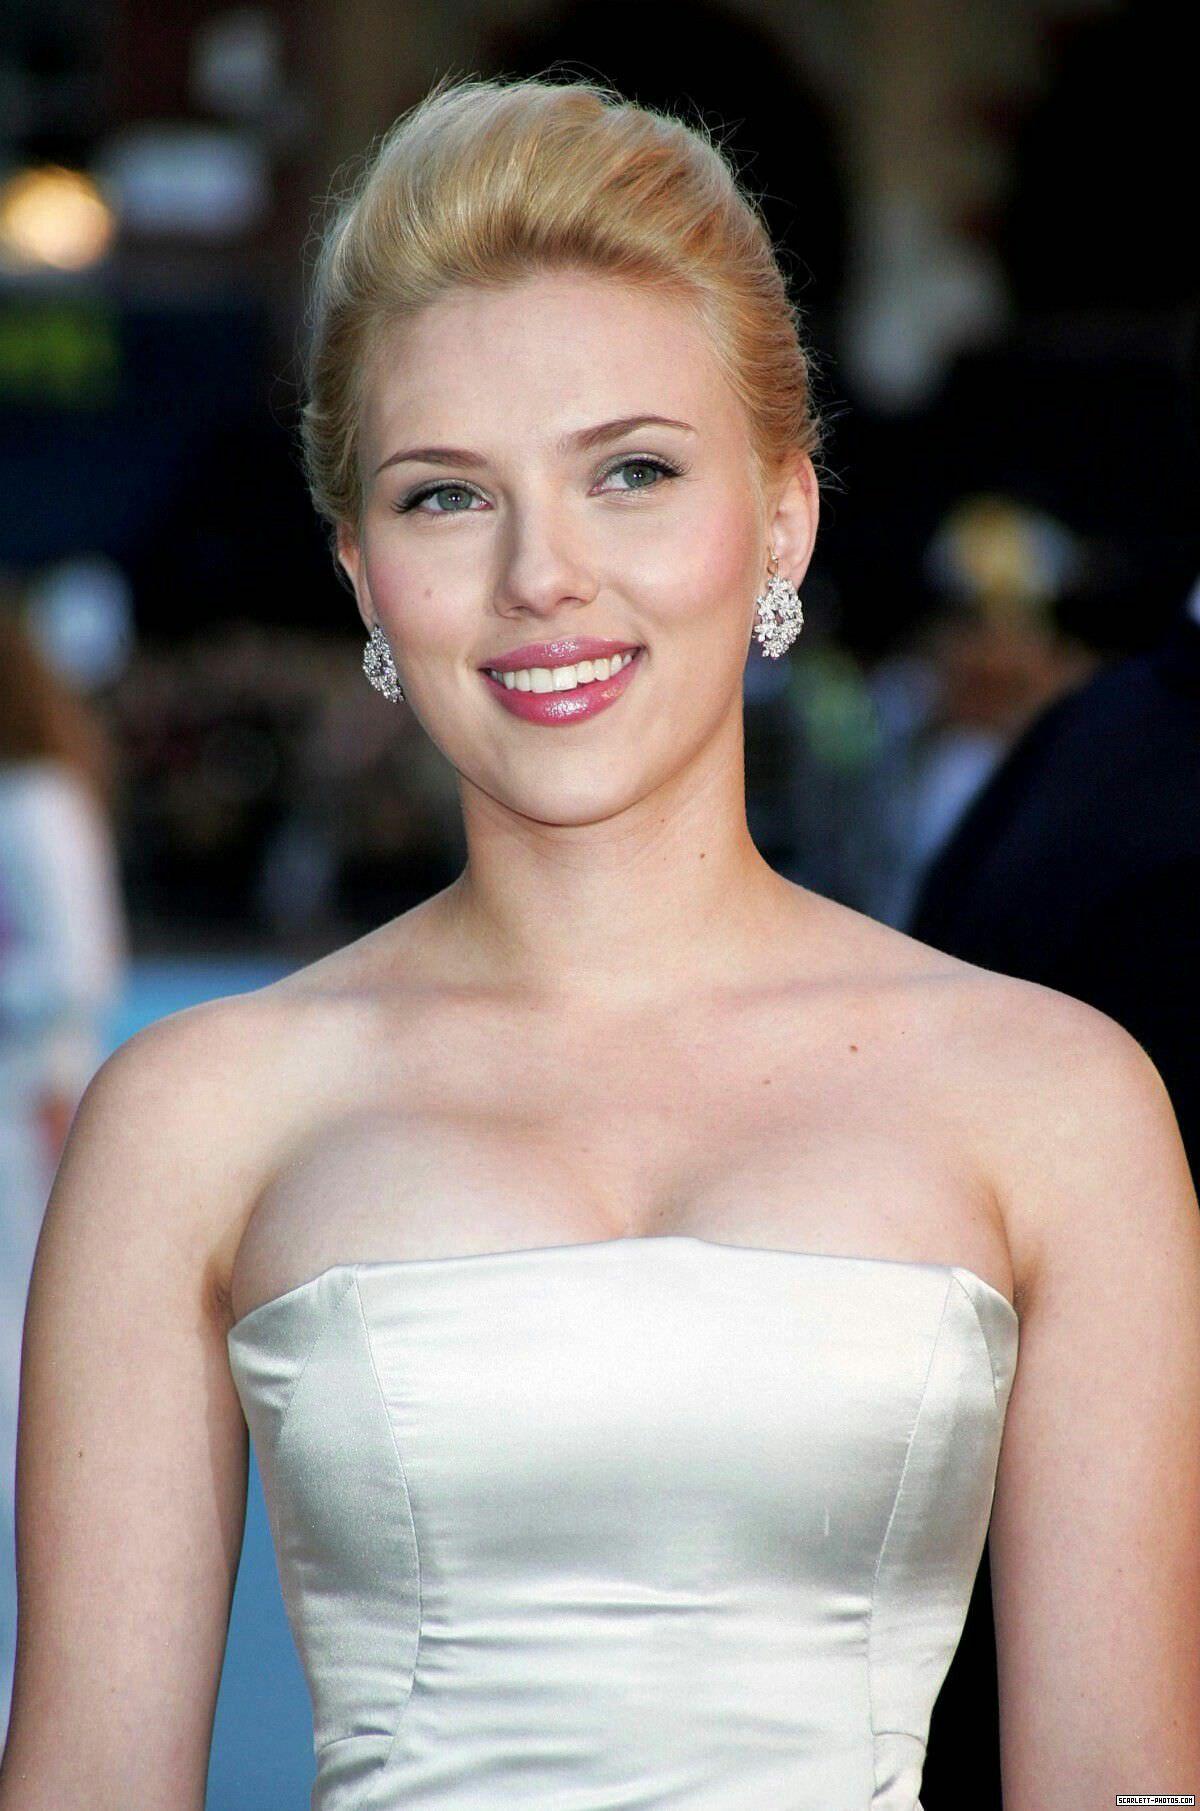 Scarlett johansson whew celebrity edition pinterest